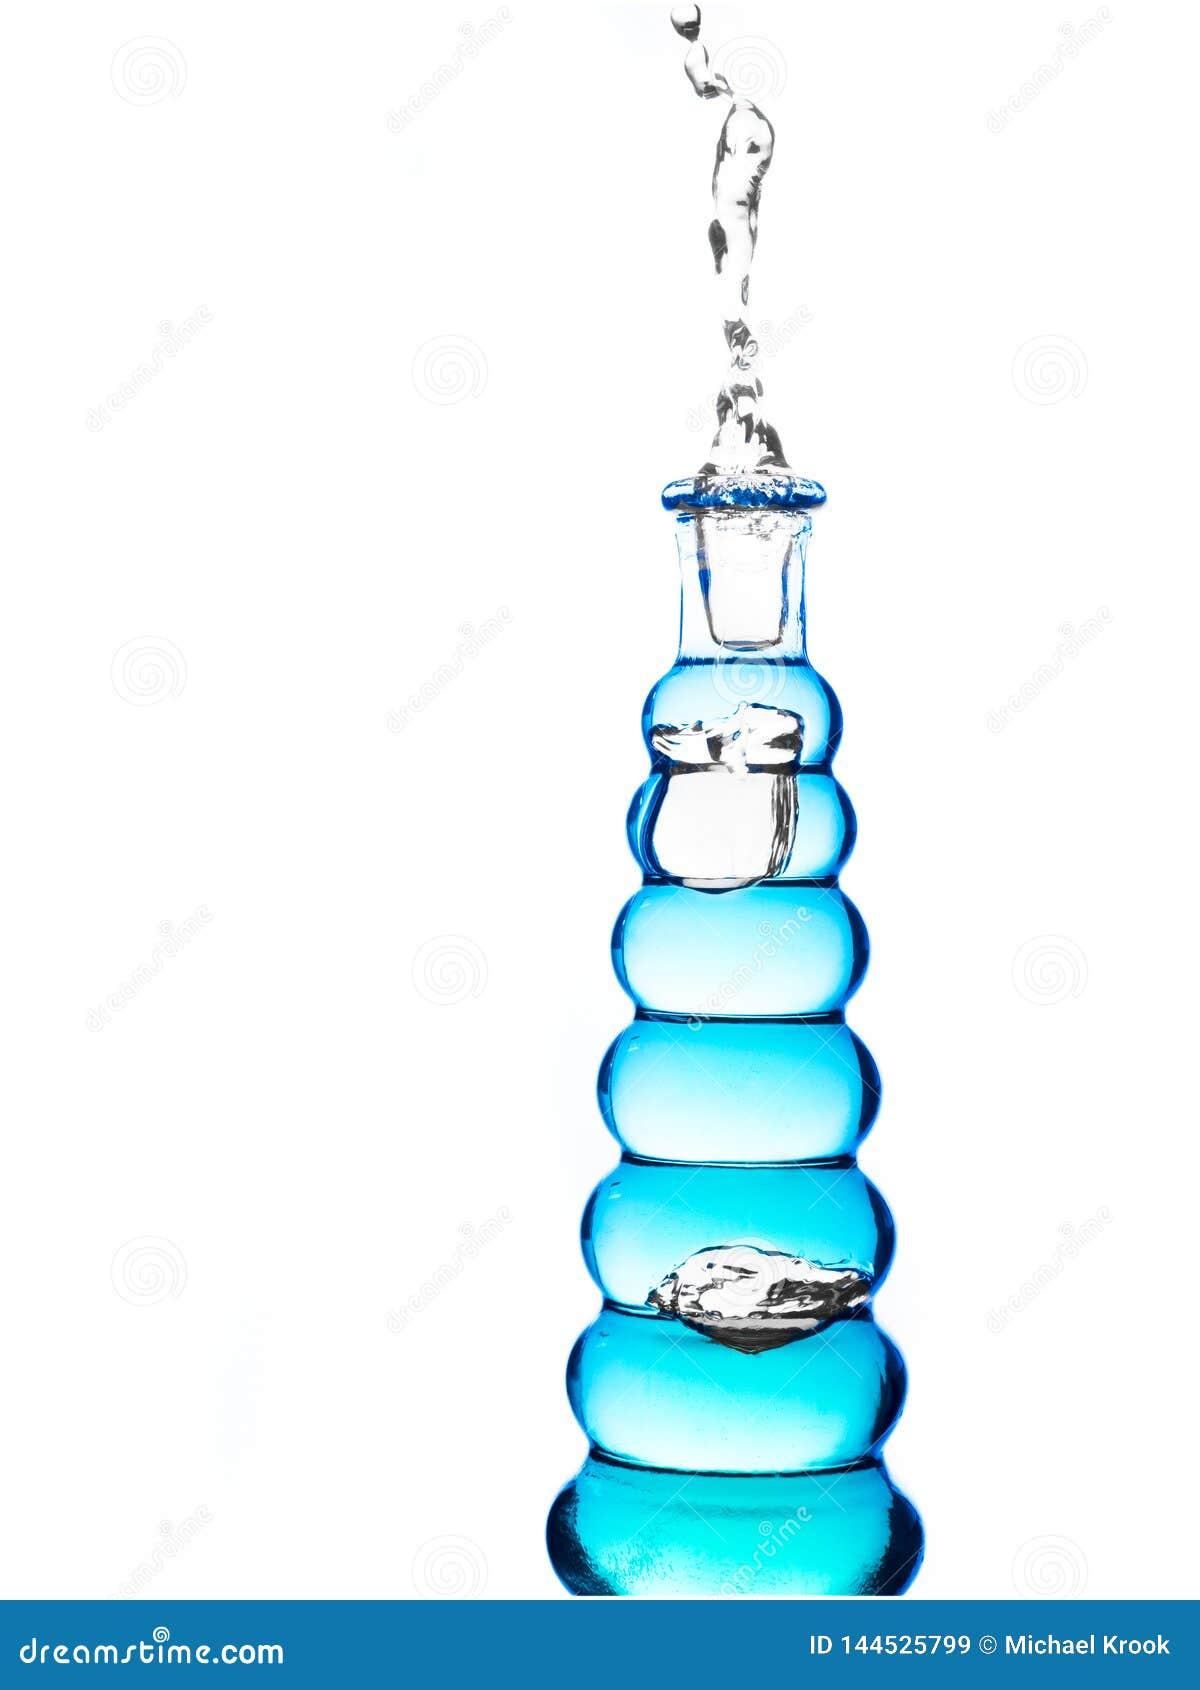 Fles met blauw water die uitgieten